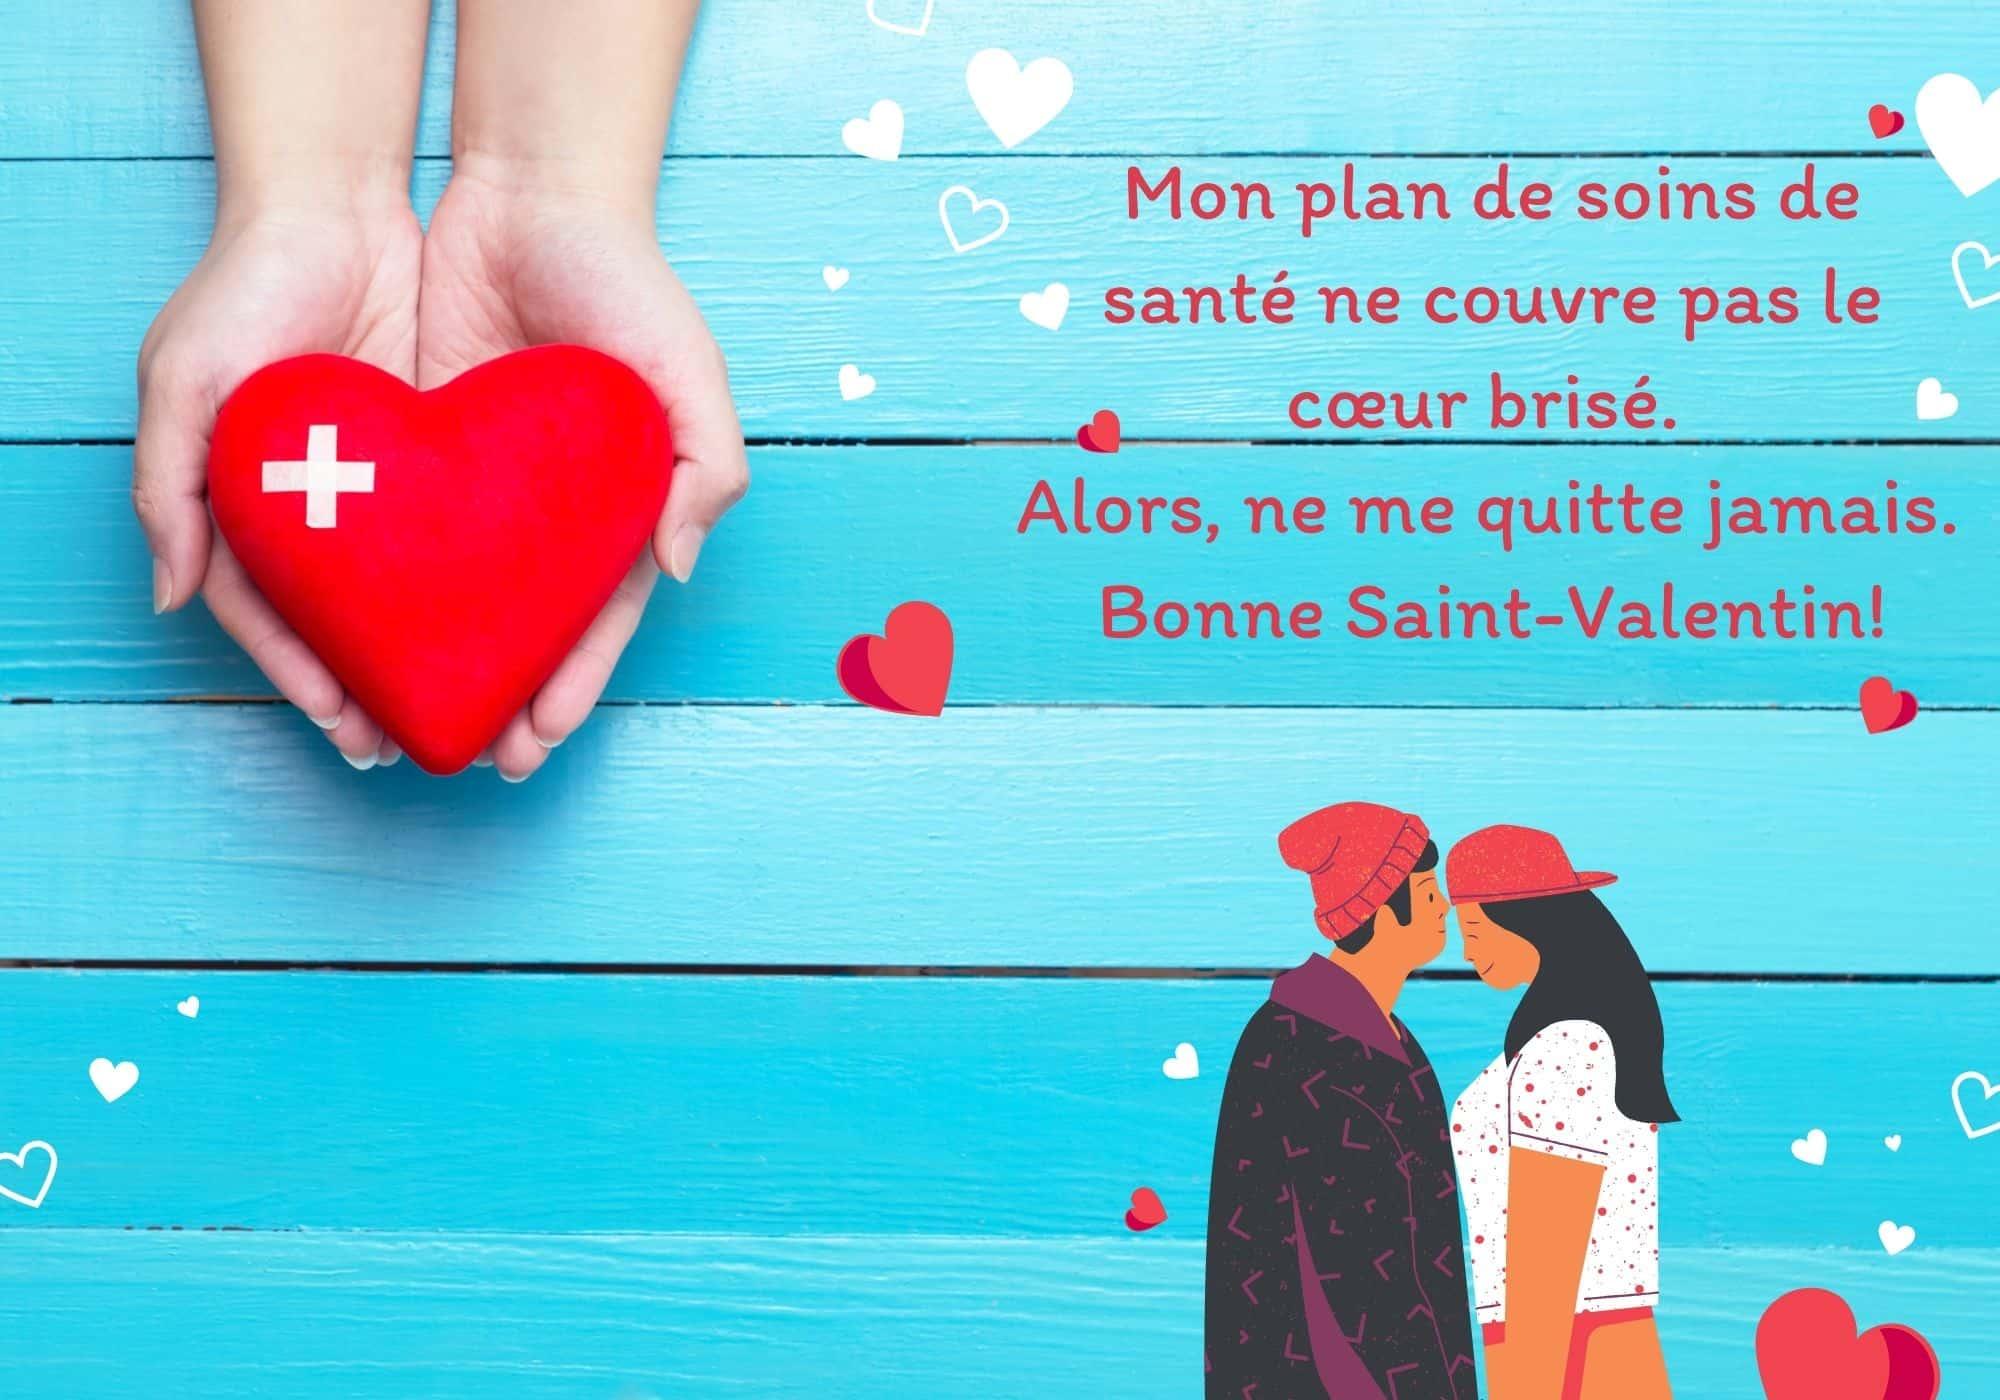 image humour saint valentin